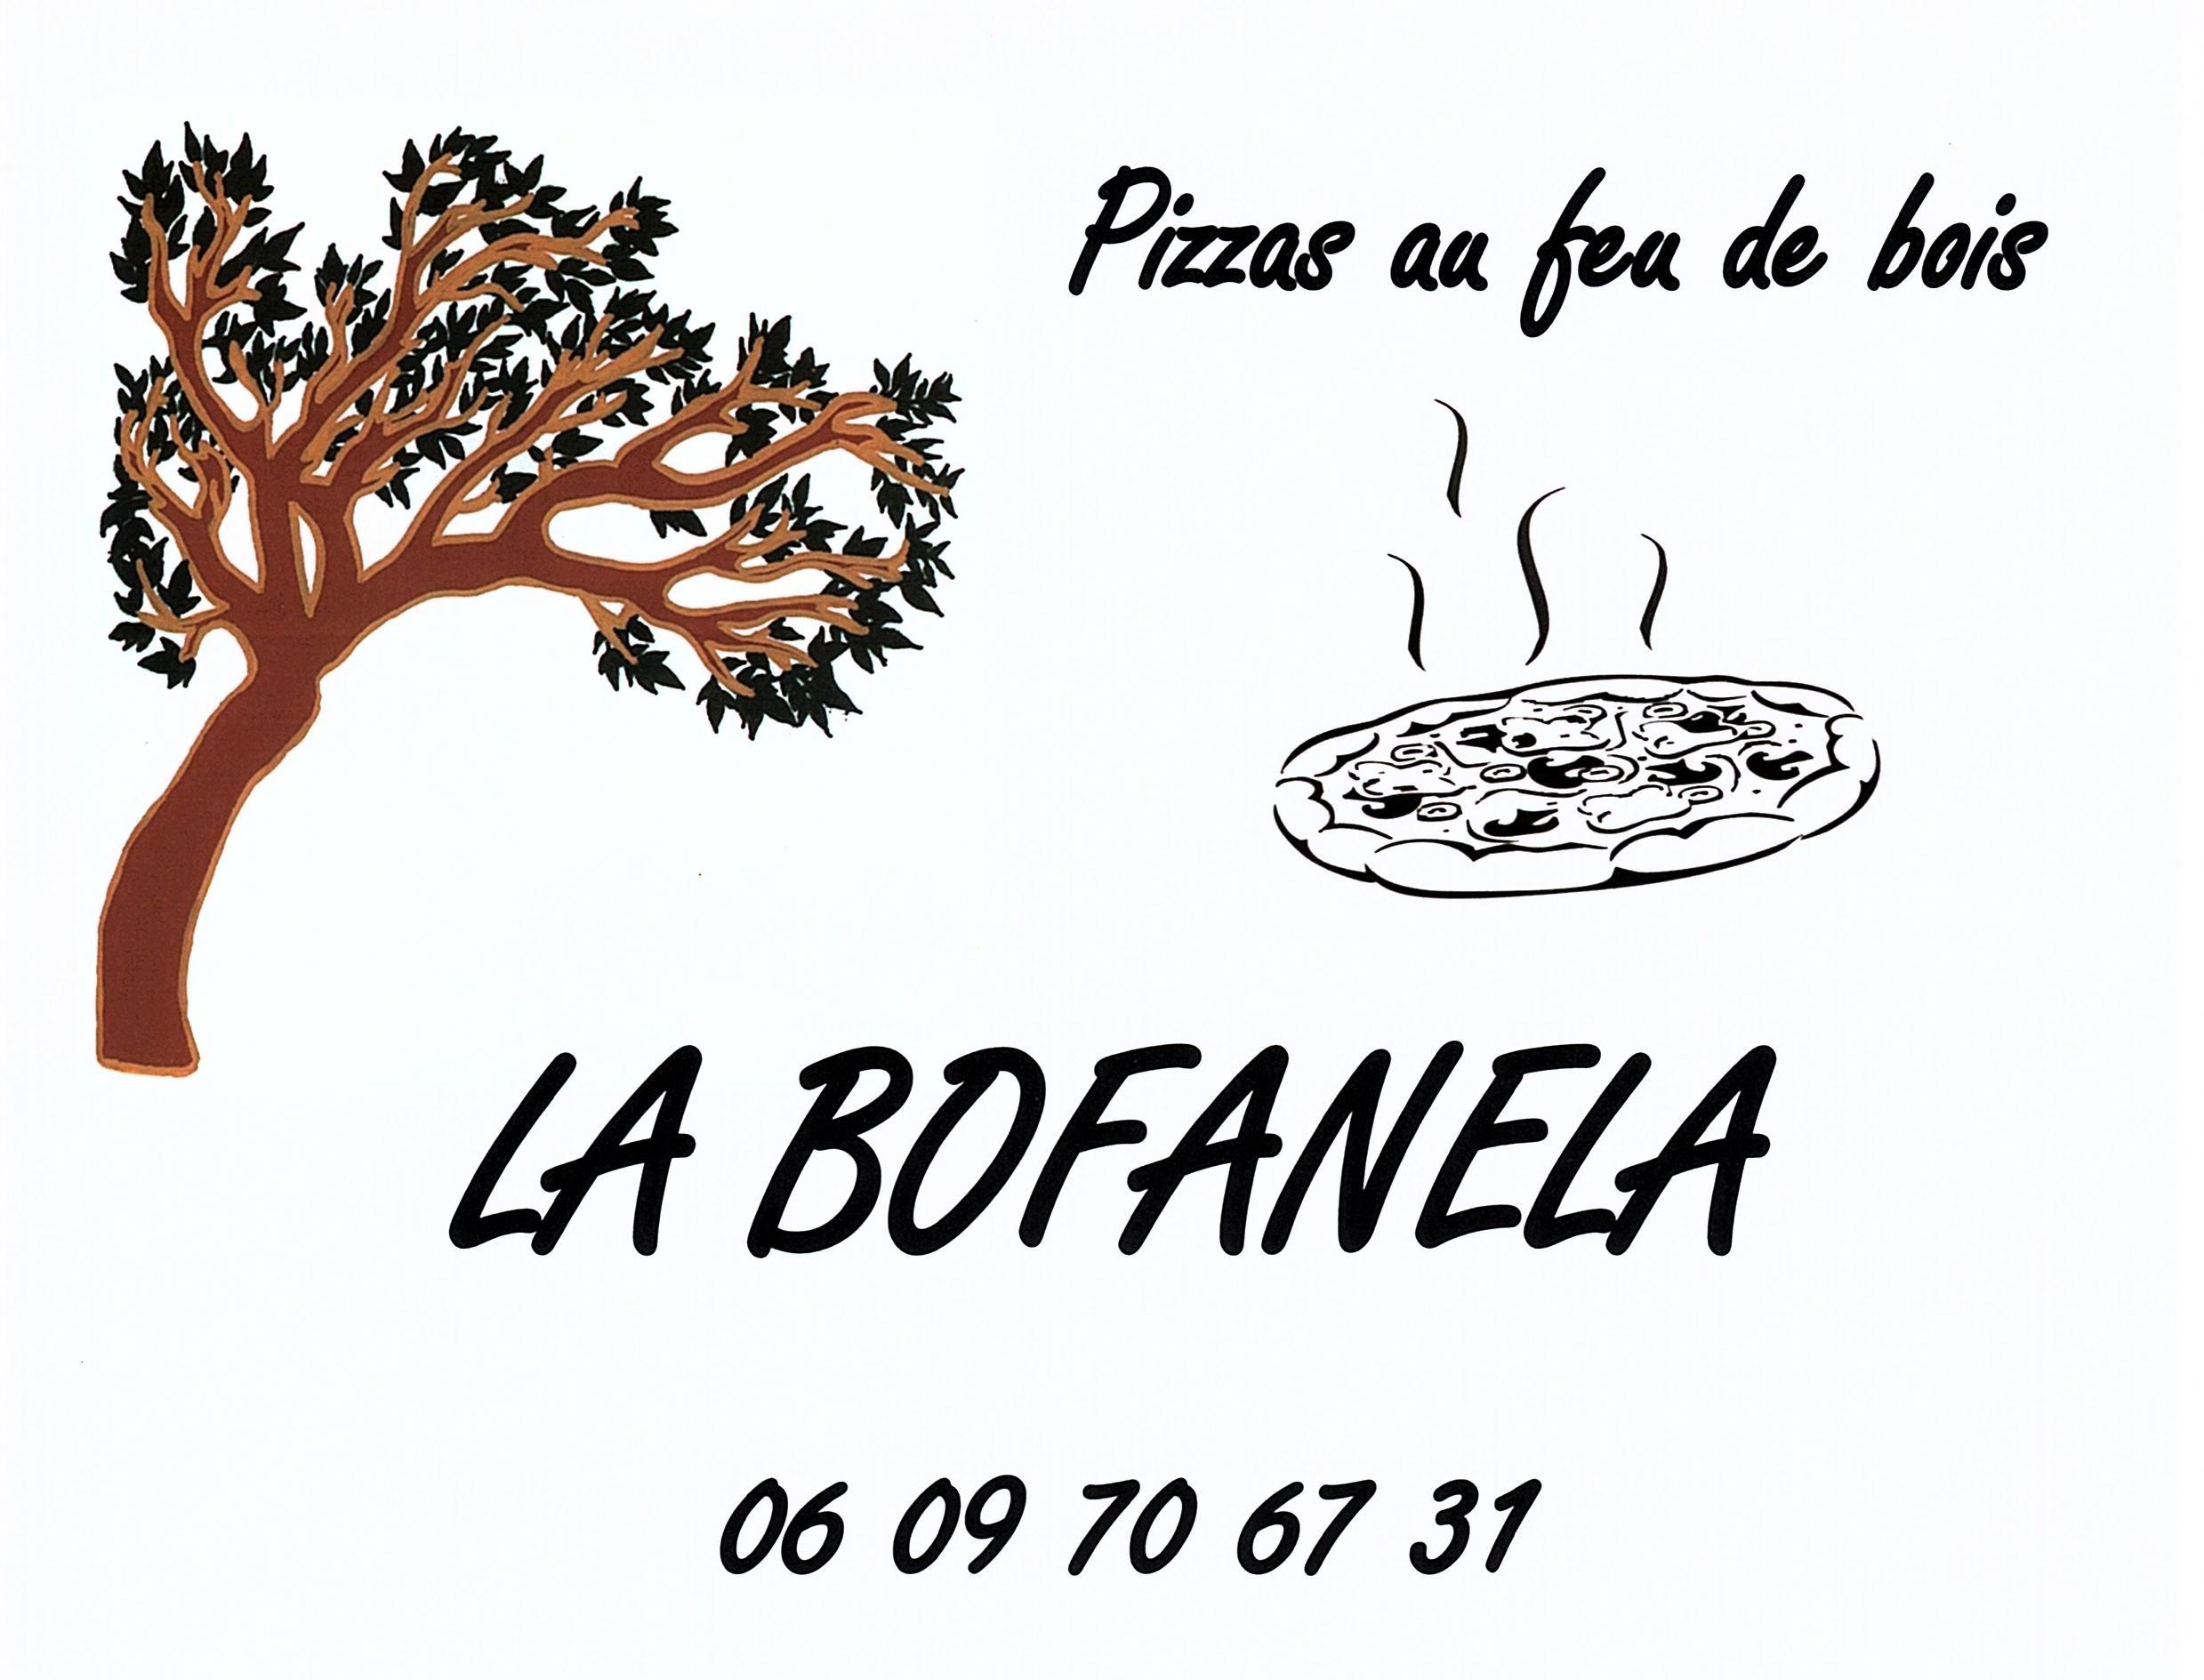 bofanela pizzeria tardets  7